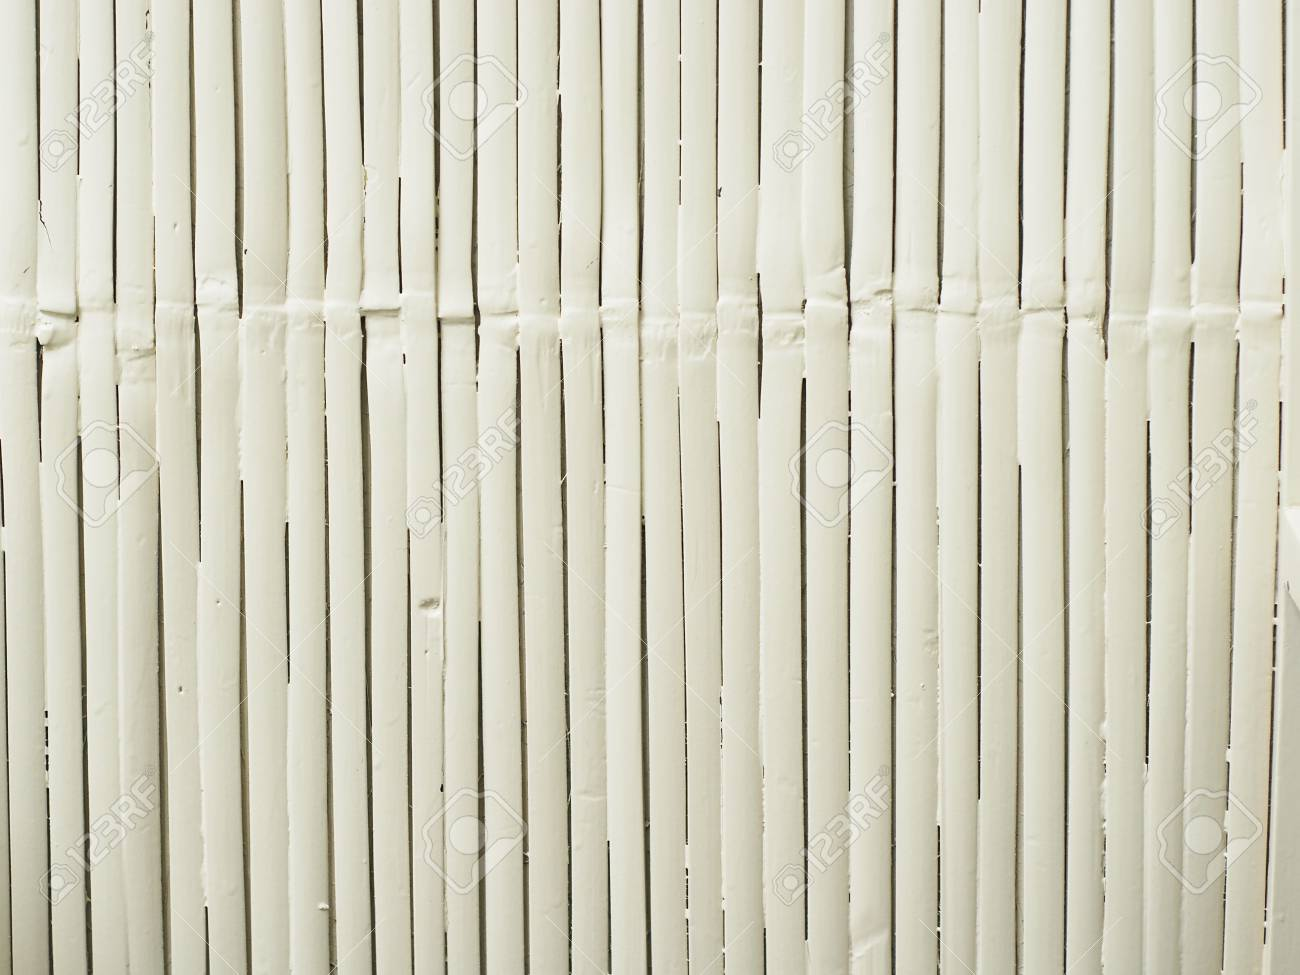 tapis de bambou blanc comme motif de texture de fond raye